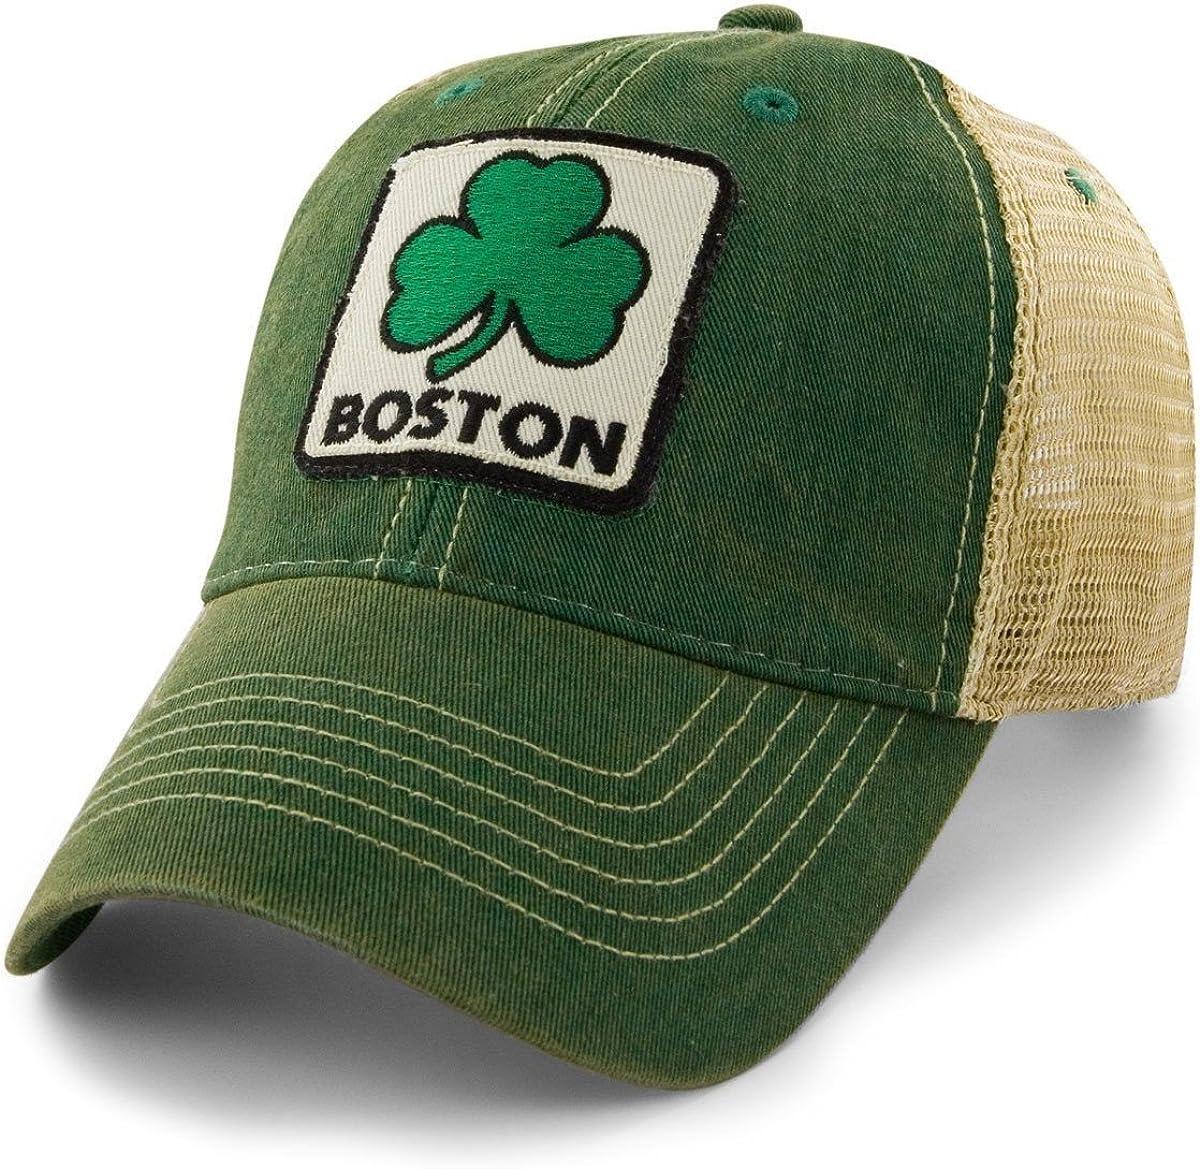 Chowdaheadz Boston Shamrock Patch Dirty - Hat Water Trucker Max San Diego Mall 83% OFF Mesh